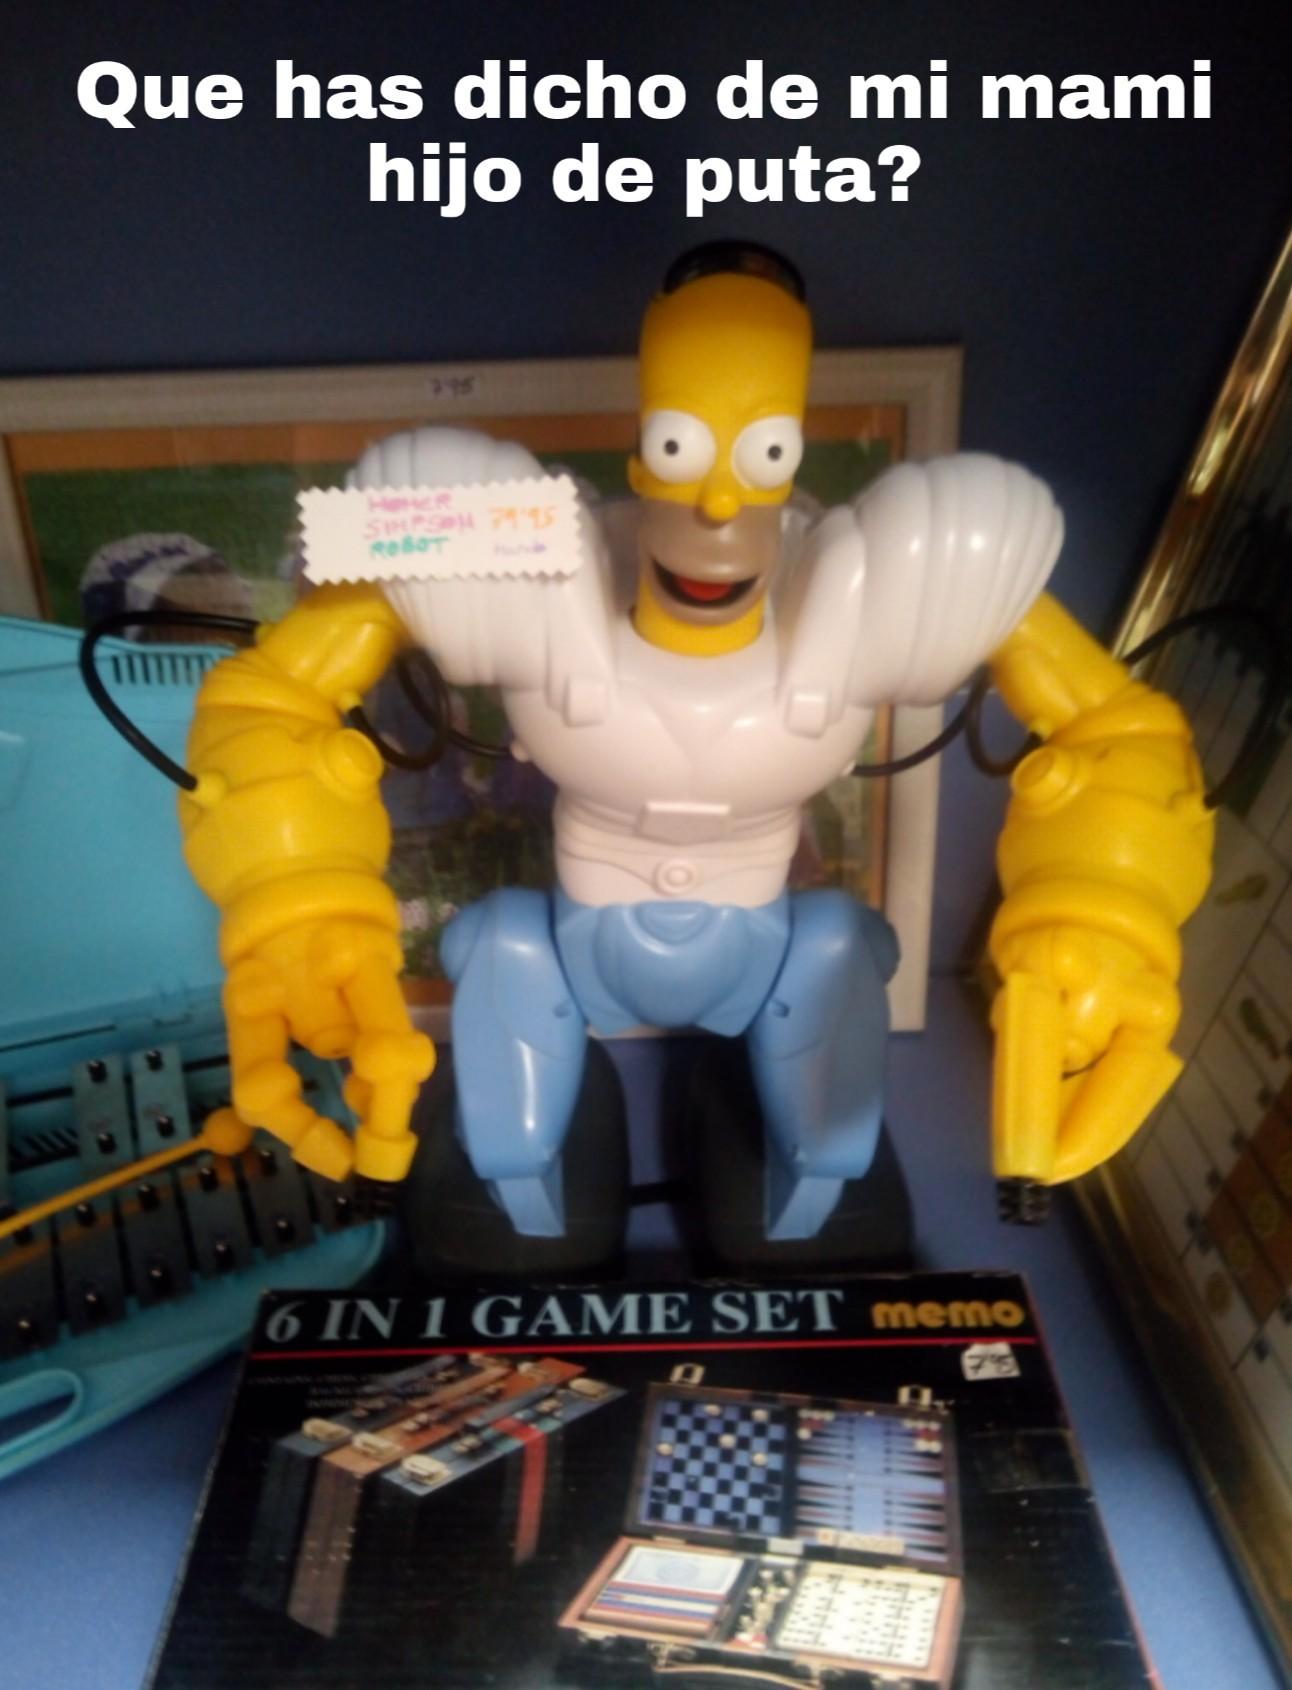 Homero robot - meme